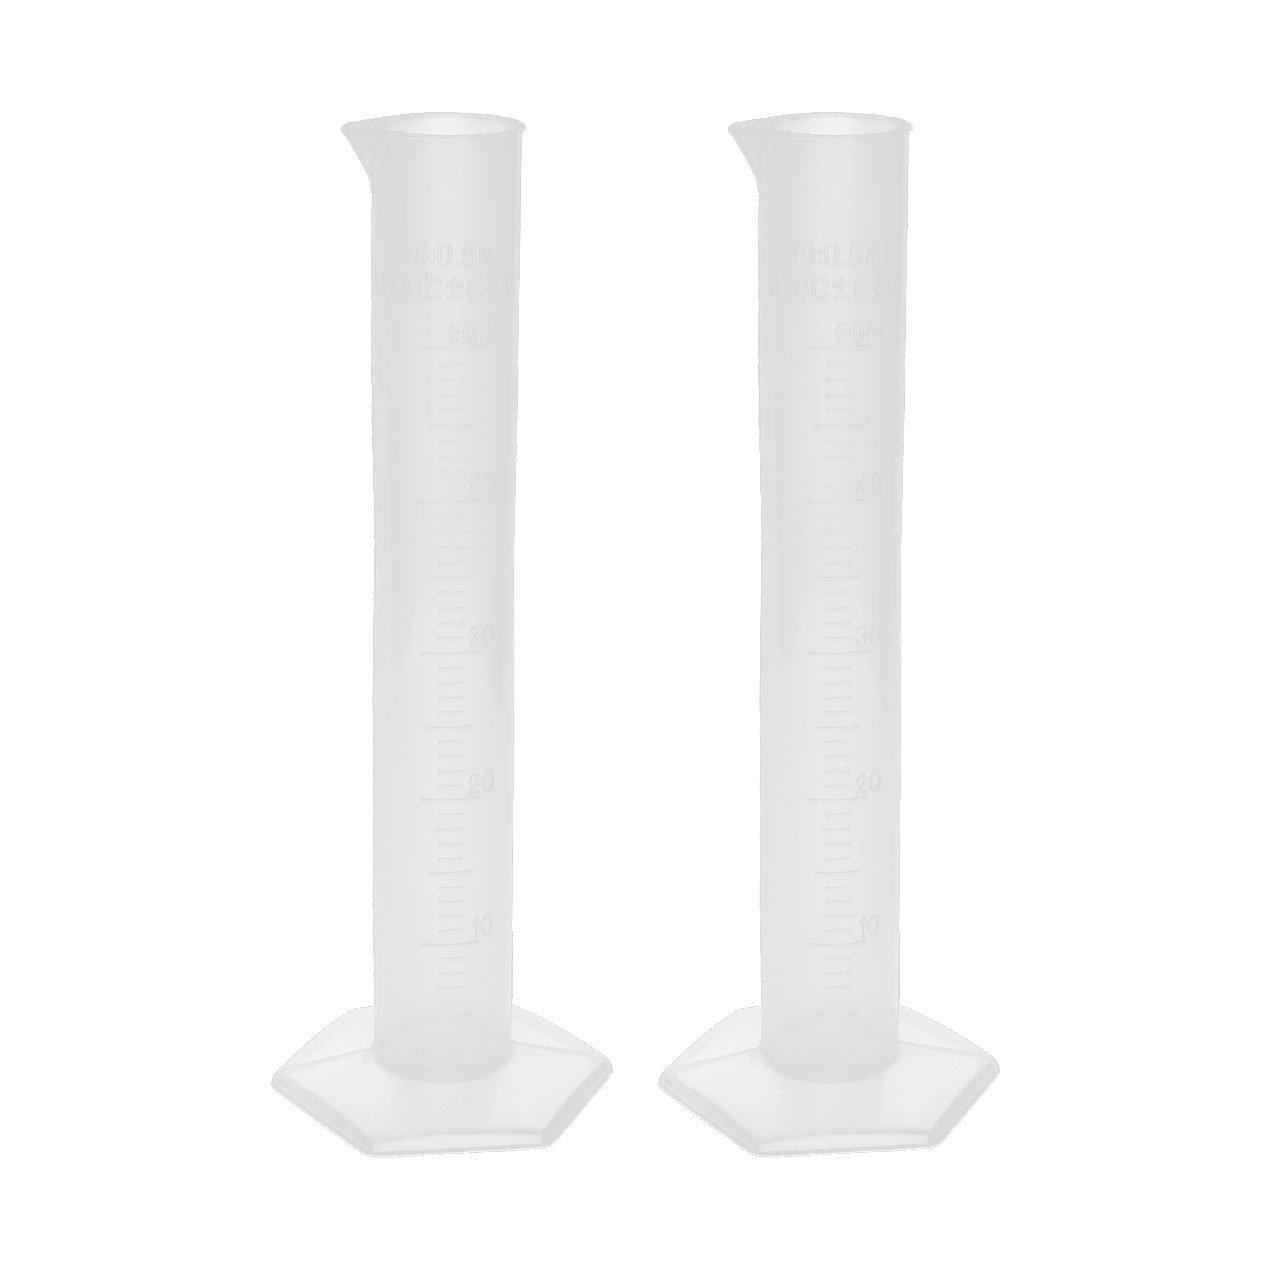 Sosw 2pcs 50ml Transparent Plastic Graduated Cylinder Lab